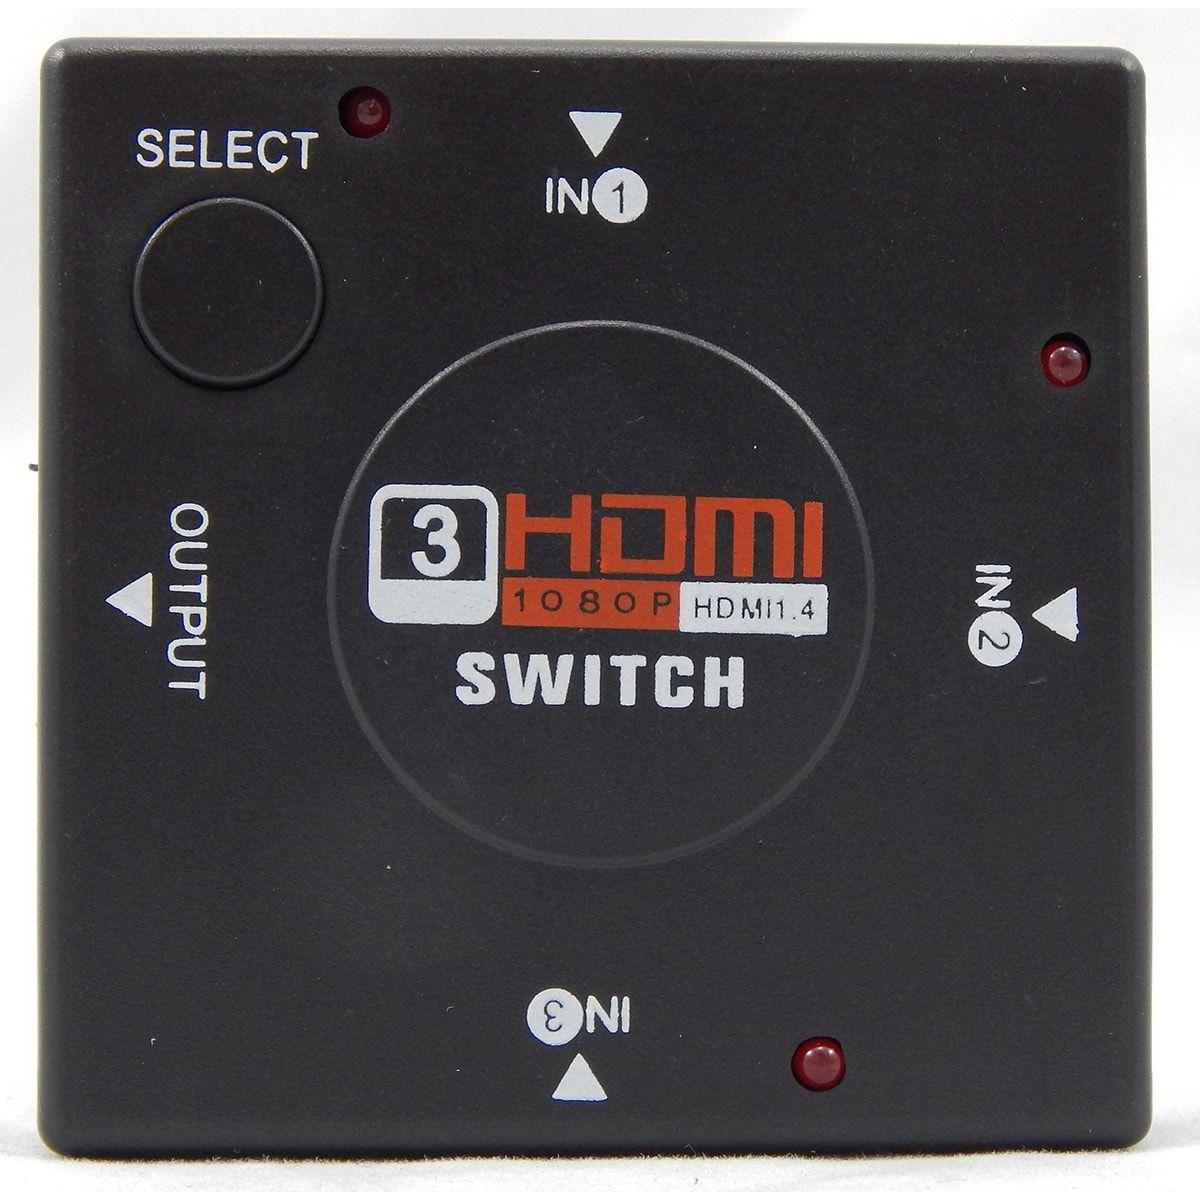 Switch HDMI com 3 Entradas e 1 Saída + 1 Cabo Hdmi de 1 Metro